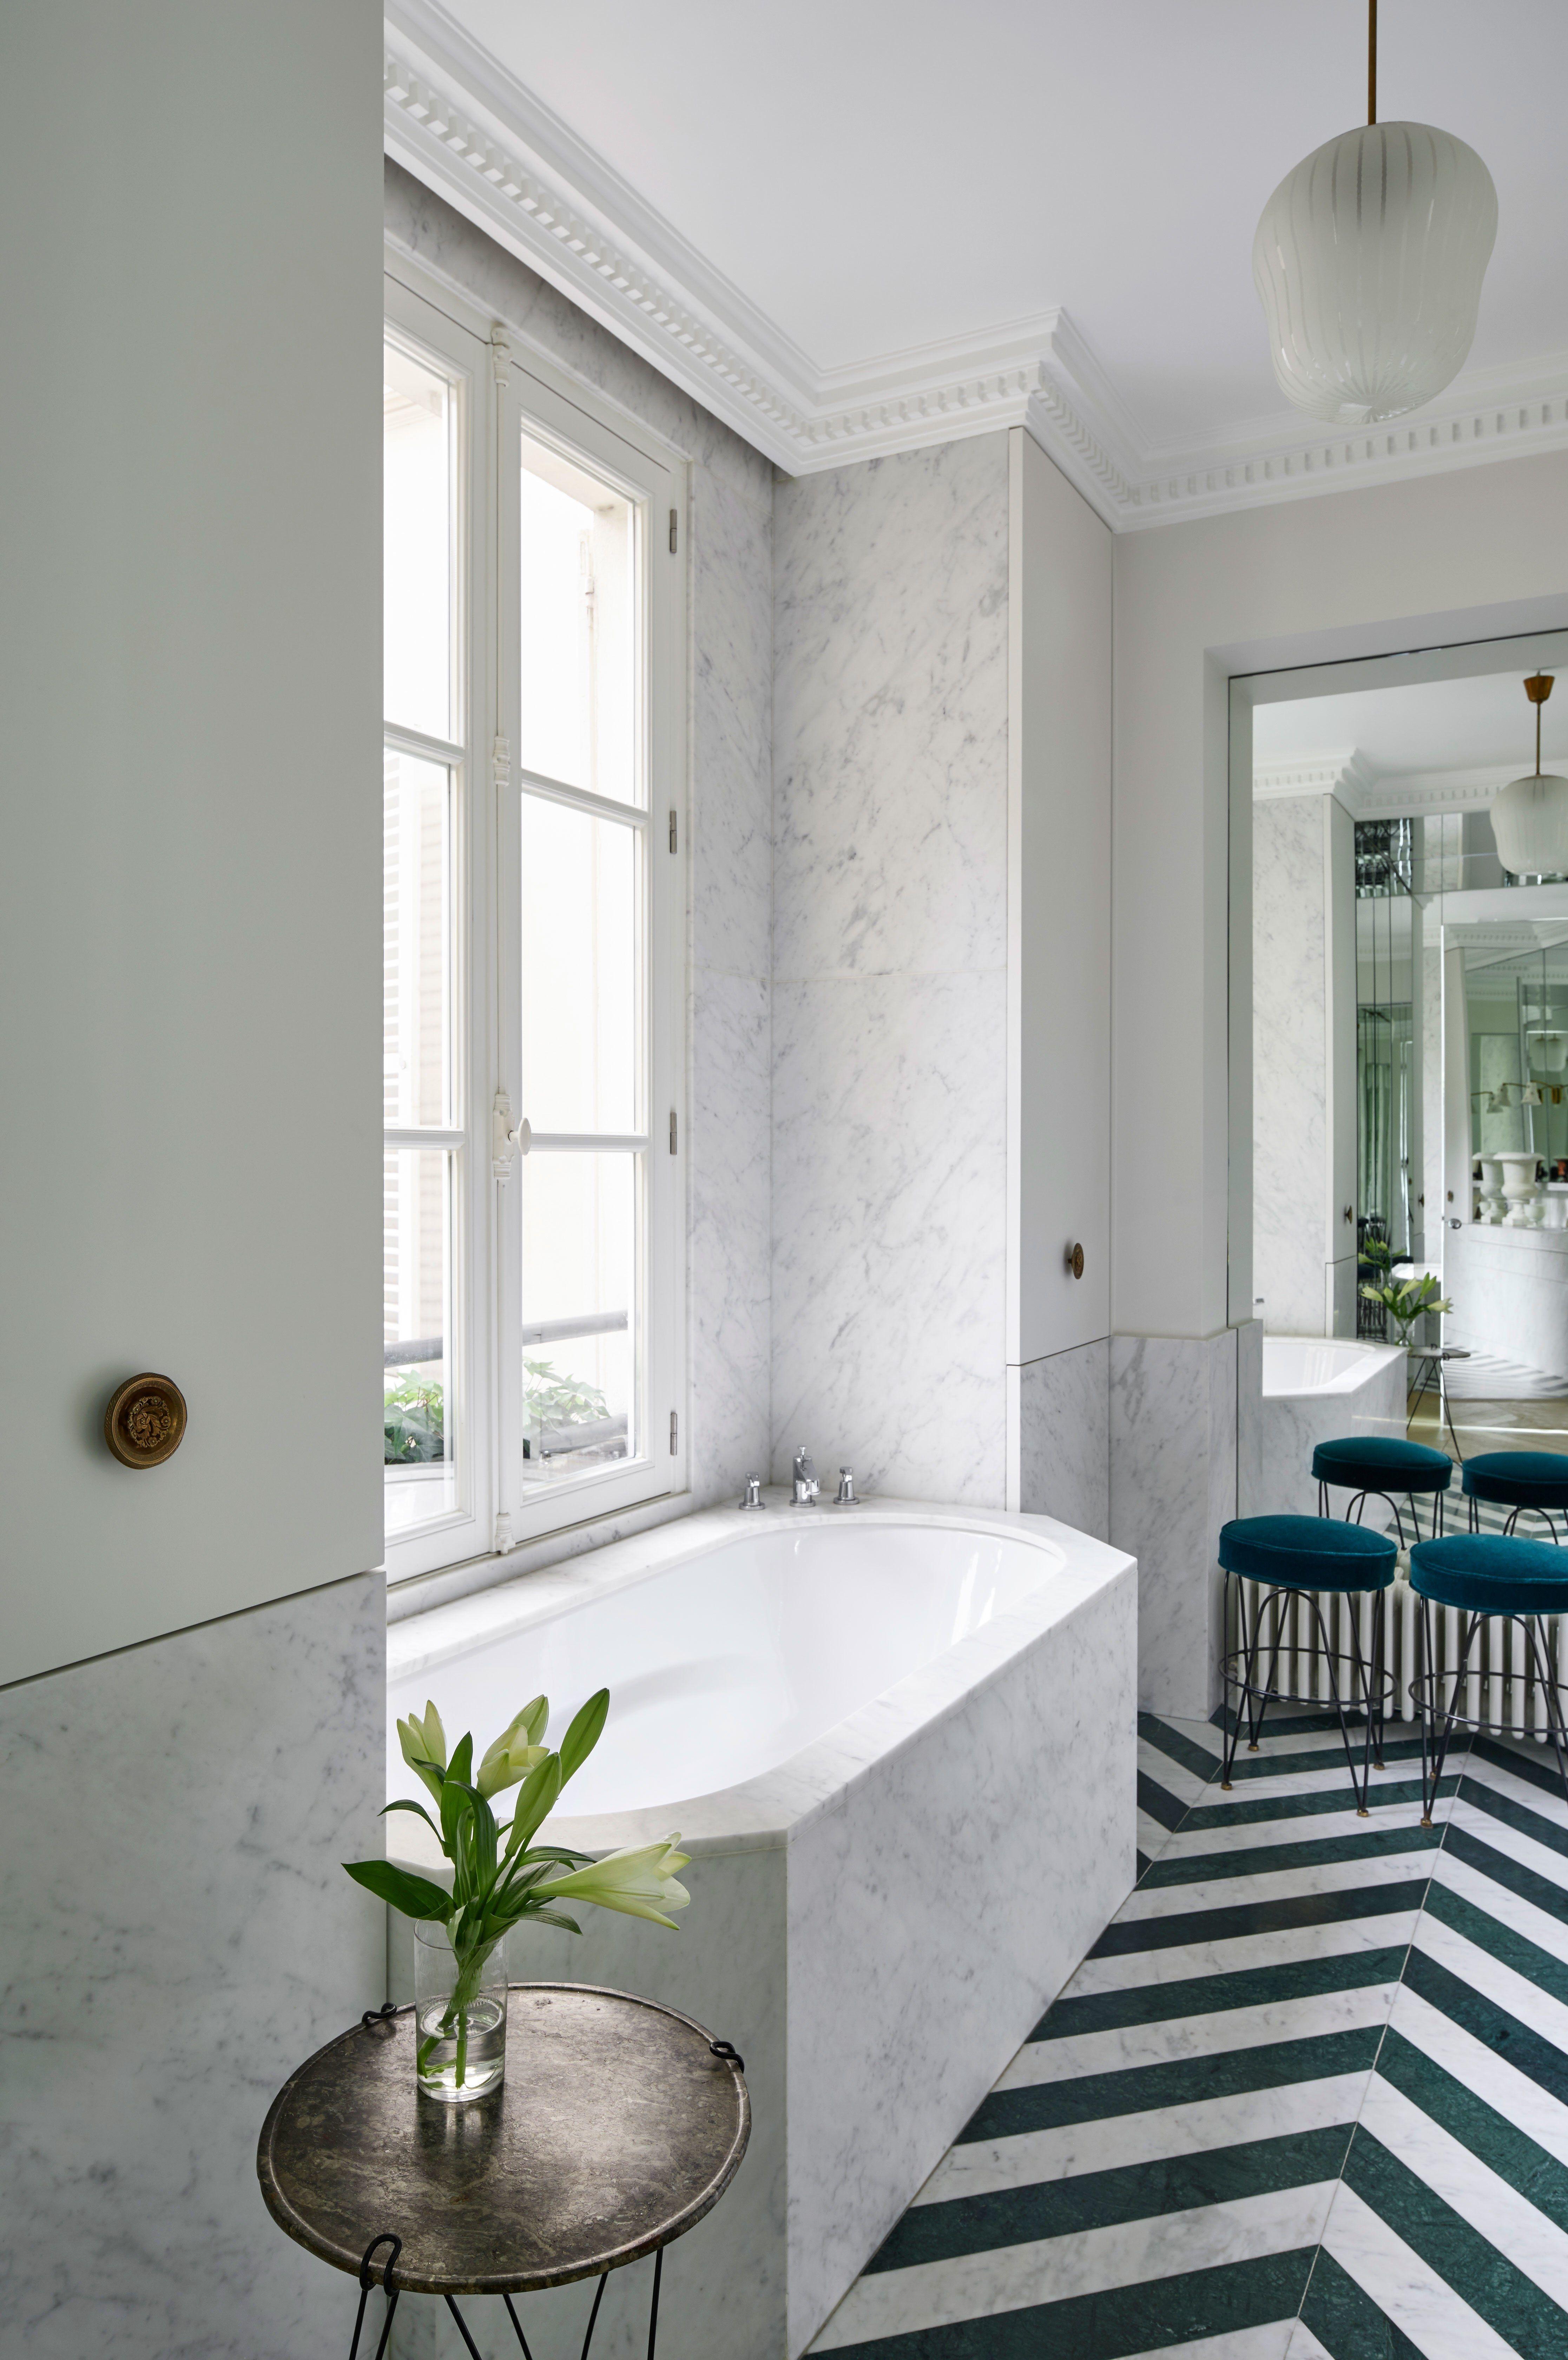 Fashion Designer Alexis Mabille S Paris Apartment Is A Romantic S Dream Parisian Bathroom Bathroom Styling Parisian Decor